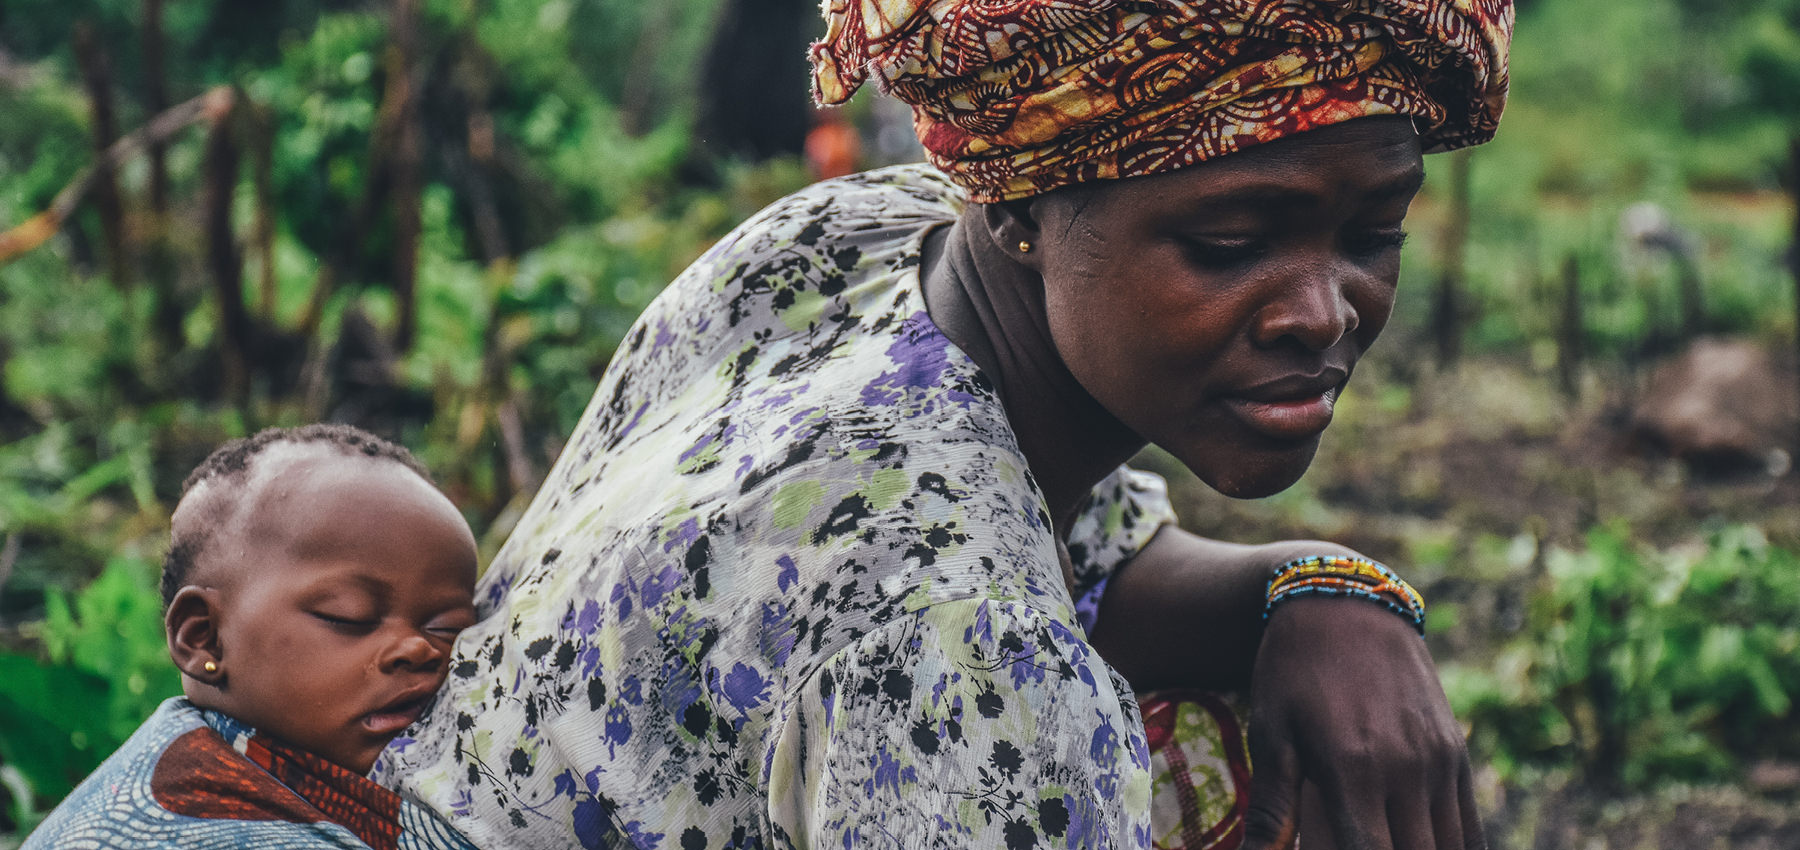 Frau mit Baby, Afrika